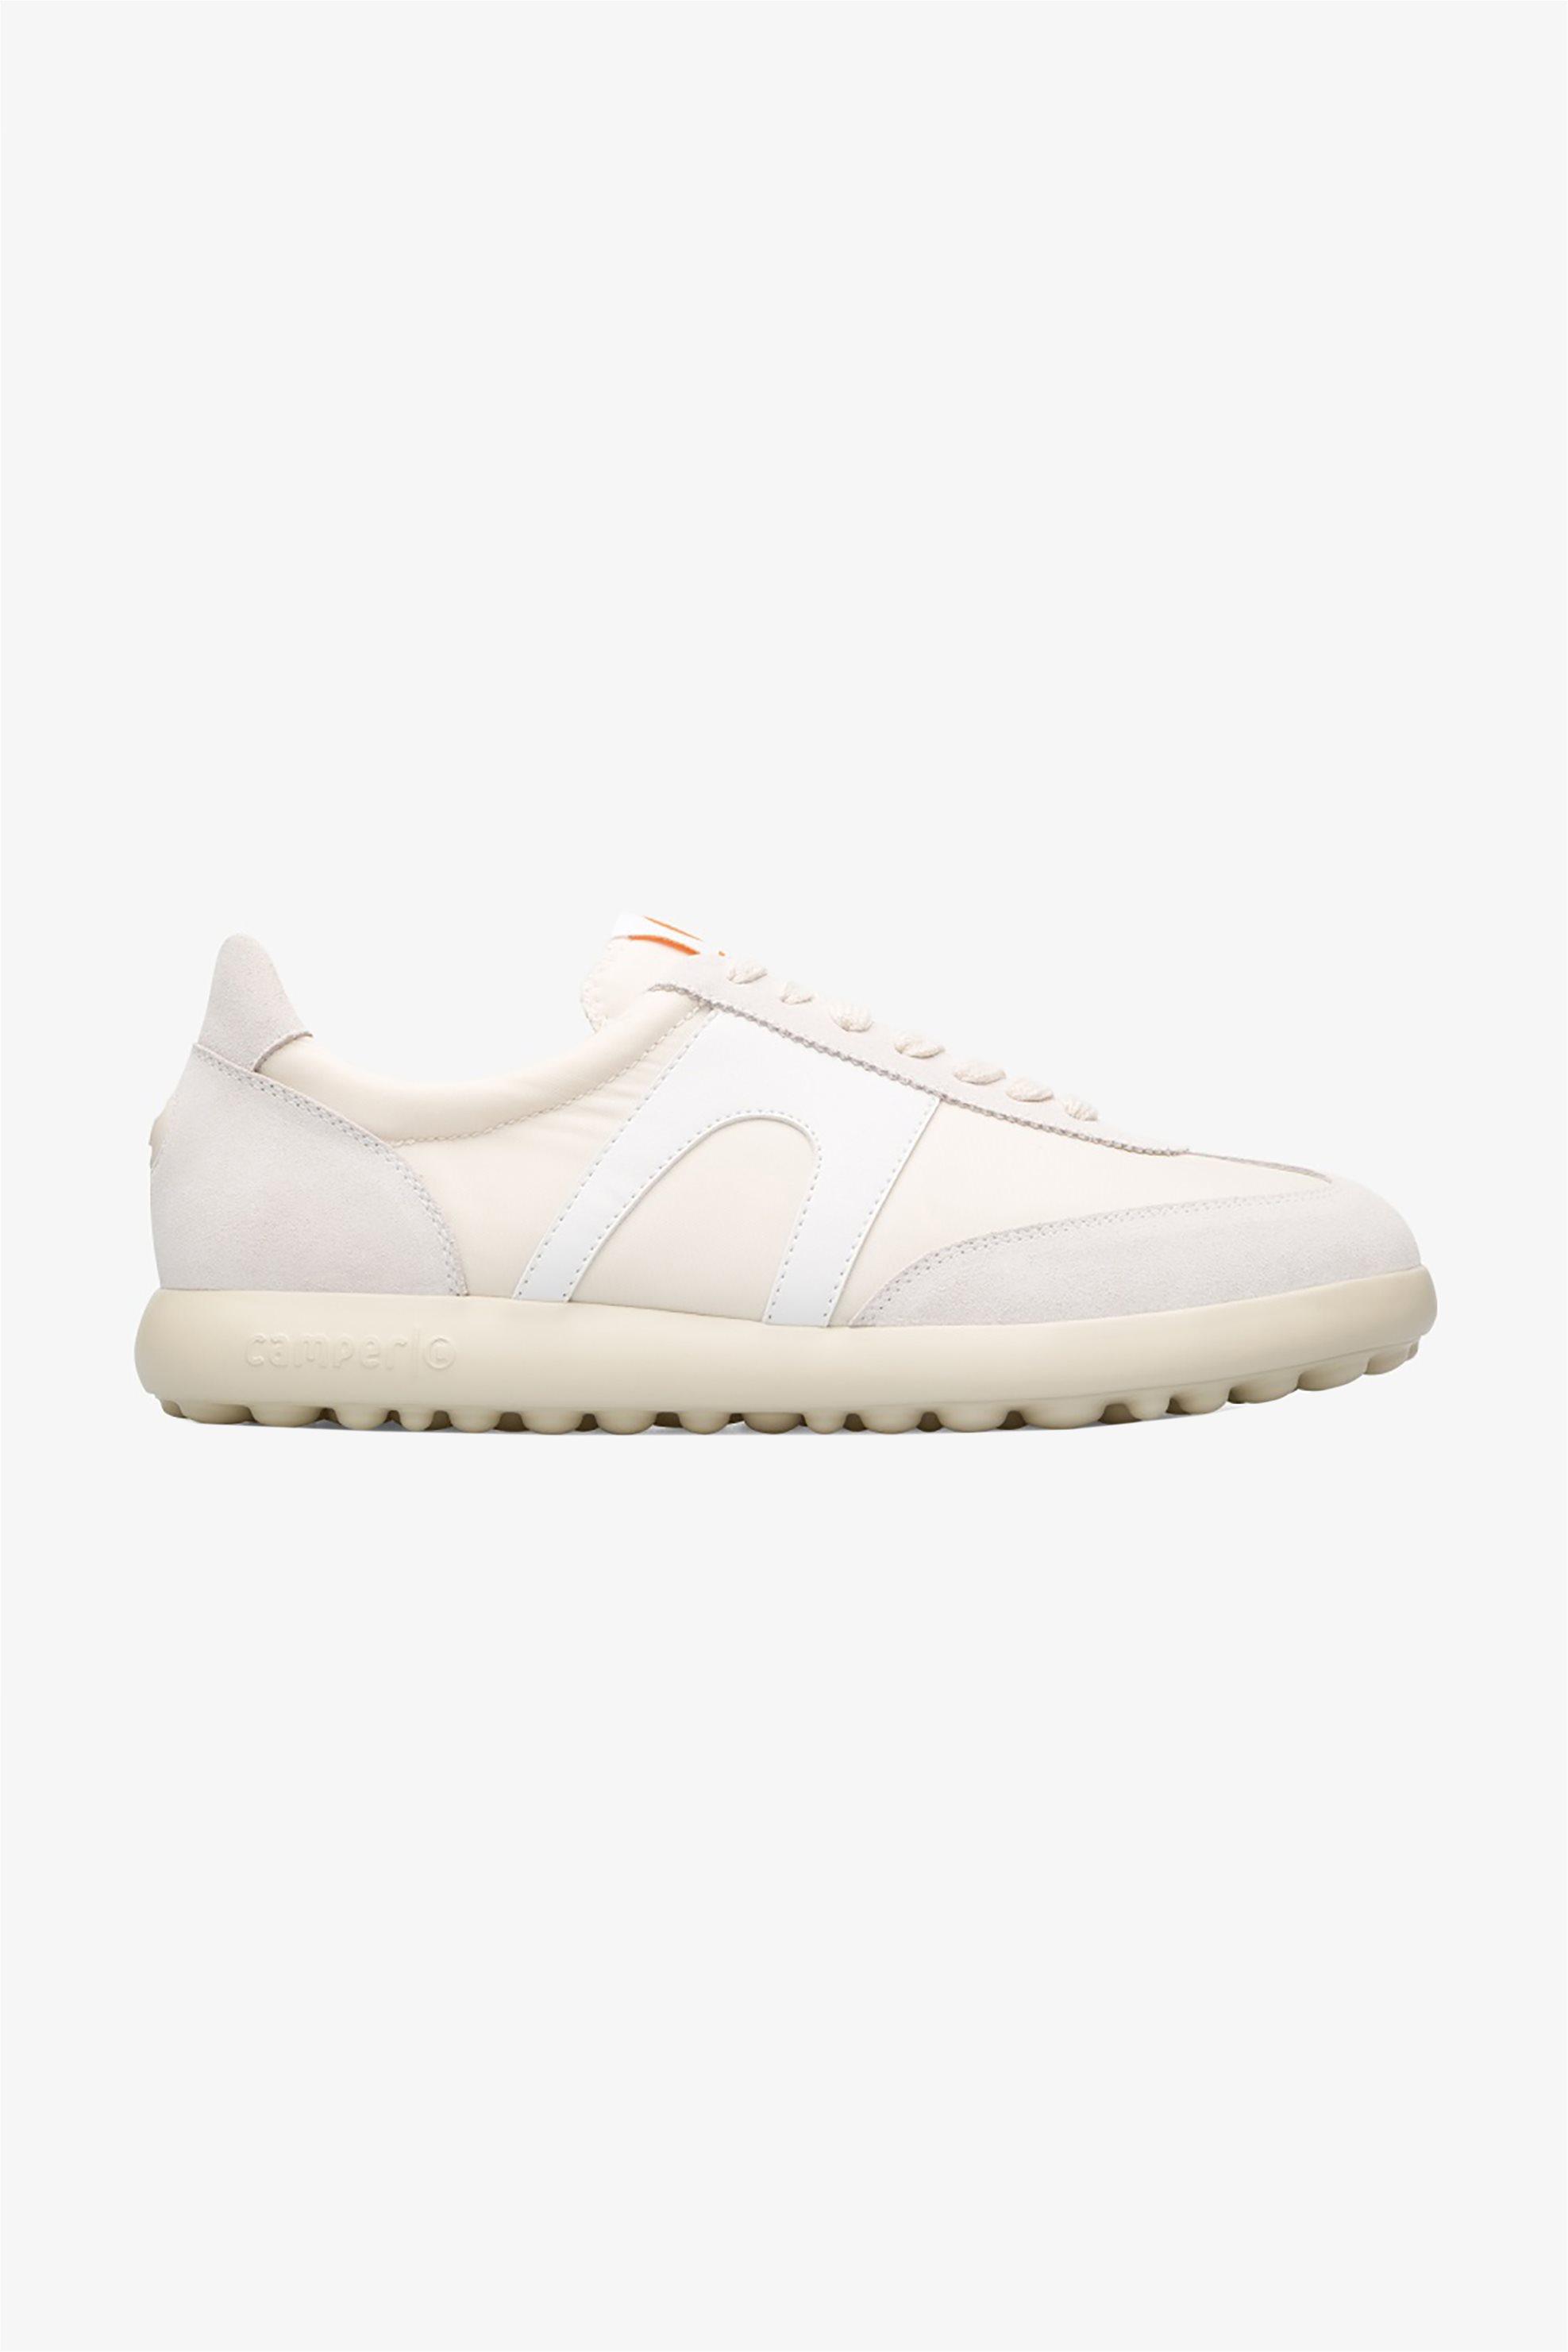 "Camper ανδρικά δερμάτινα sneakers ""Pelotas XLite"" – K100545-009 – Λευκό"